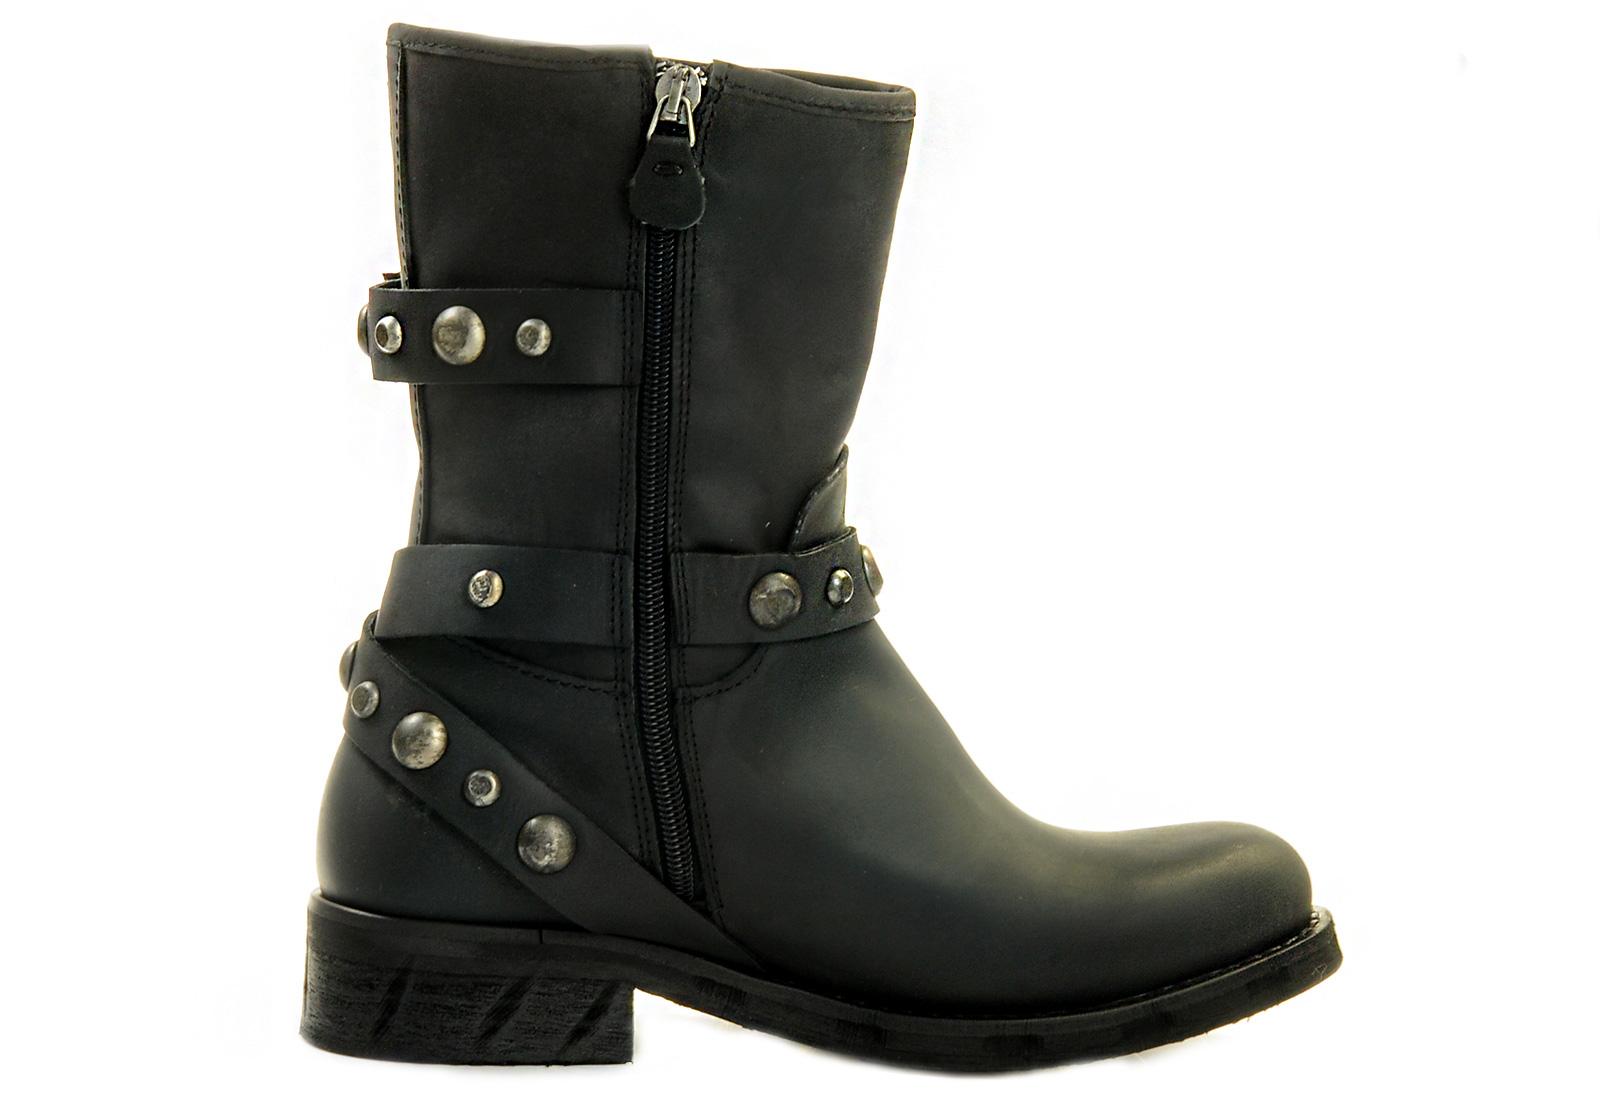 540ea0c54b Tommy Hilfiger Csizma - Biker 1a - 13f-6052-990 - Office Shoes ...